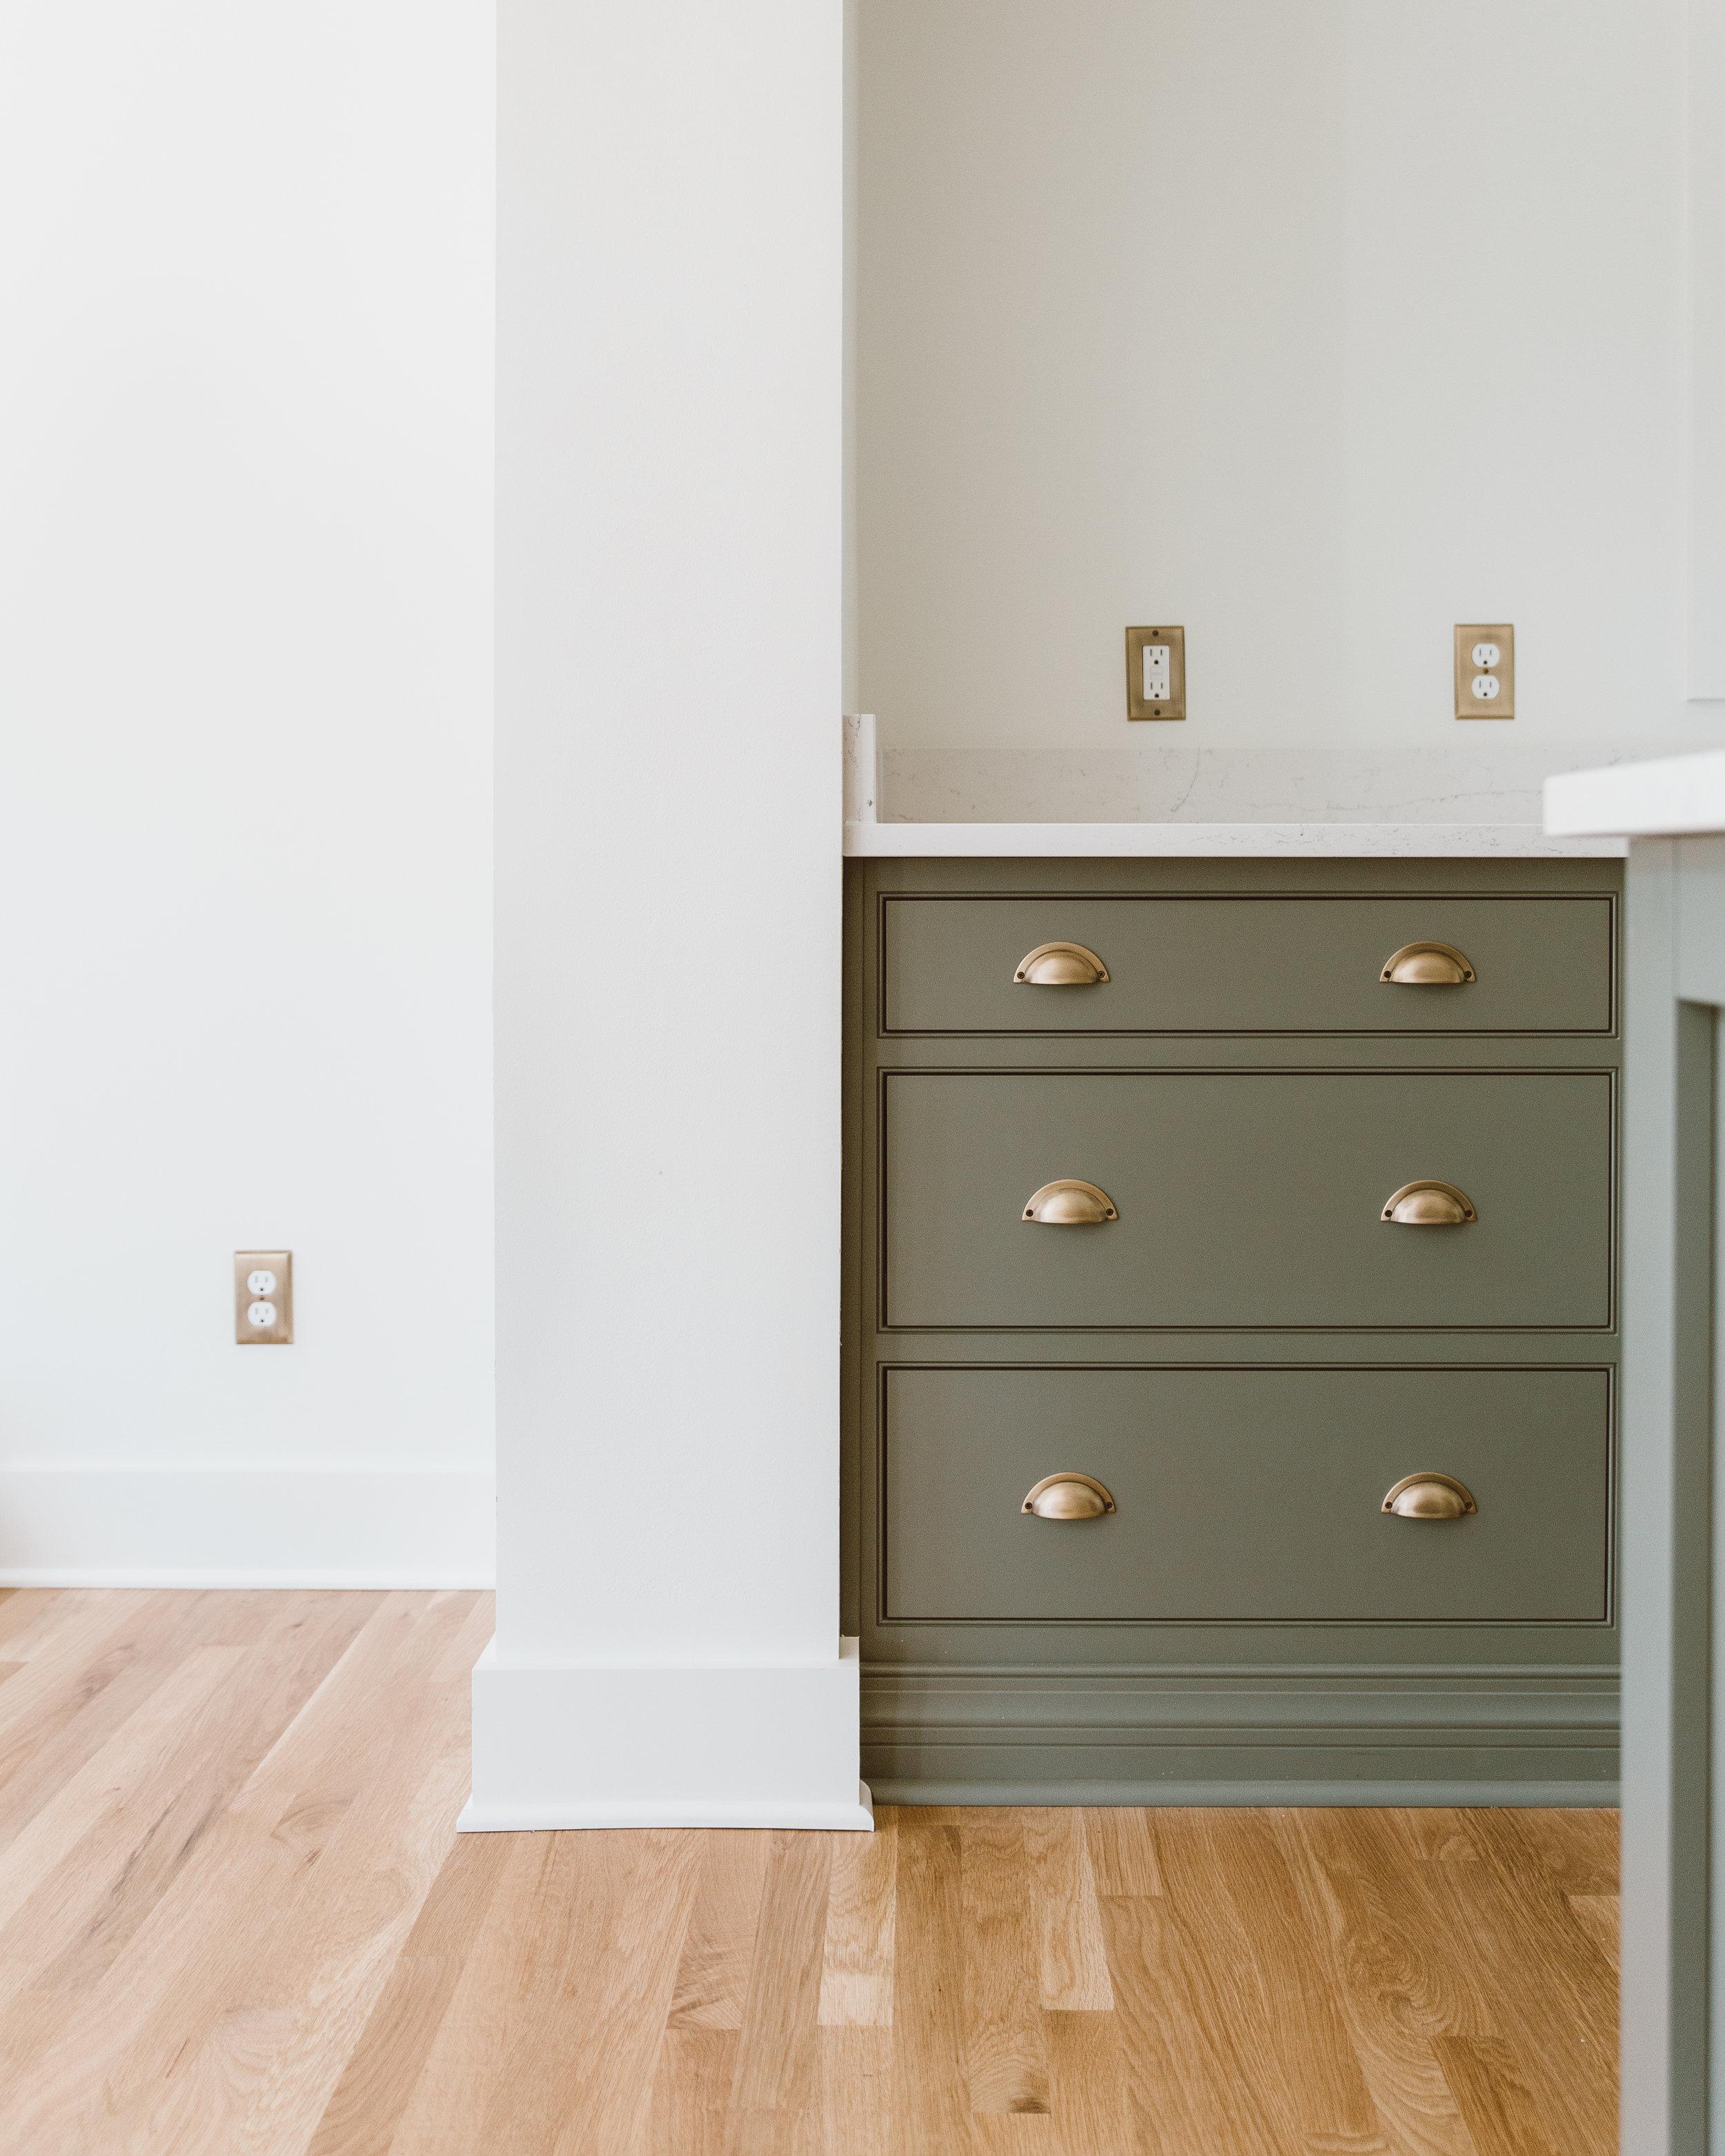 forthehome-nostalgic-warehouse-kitchen-cabinet-hardware01.jpg